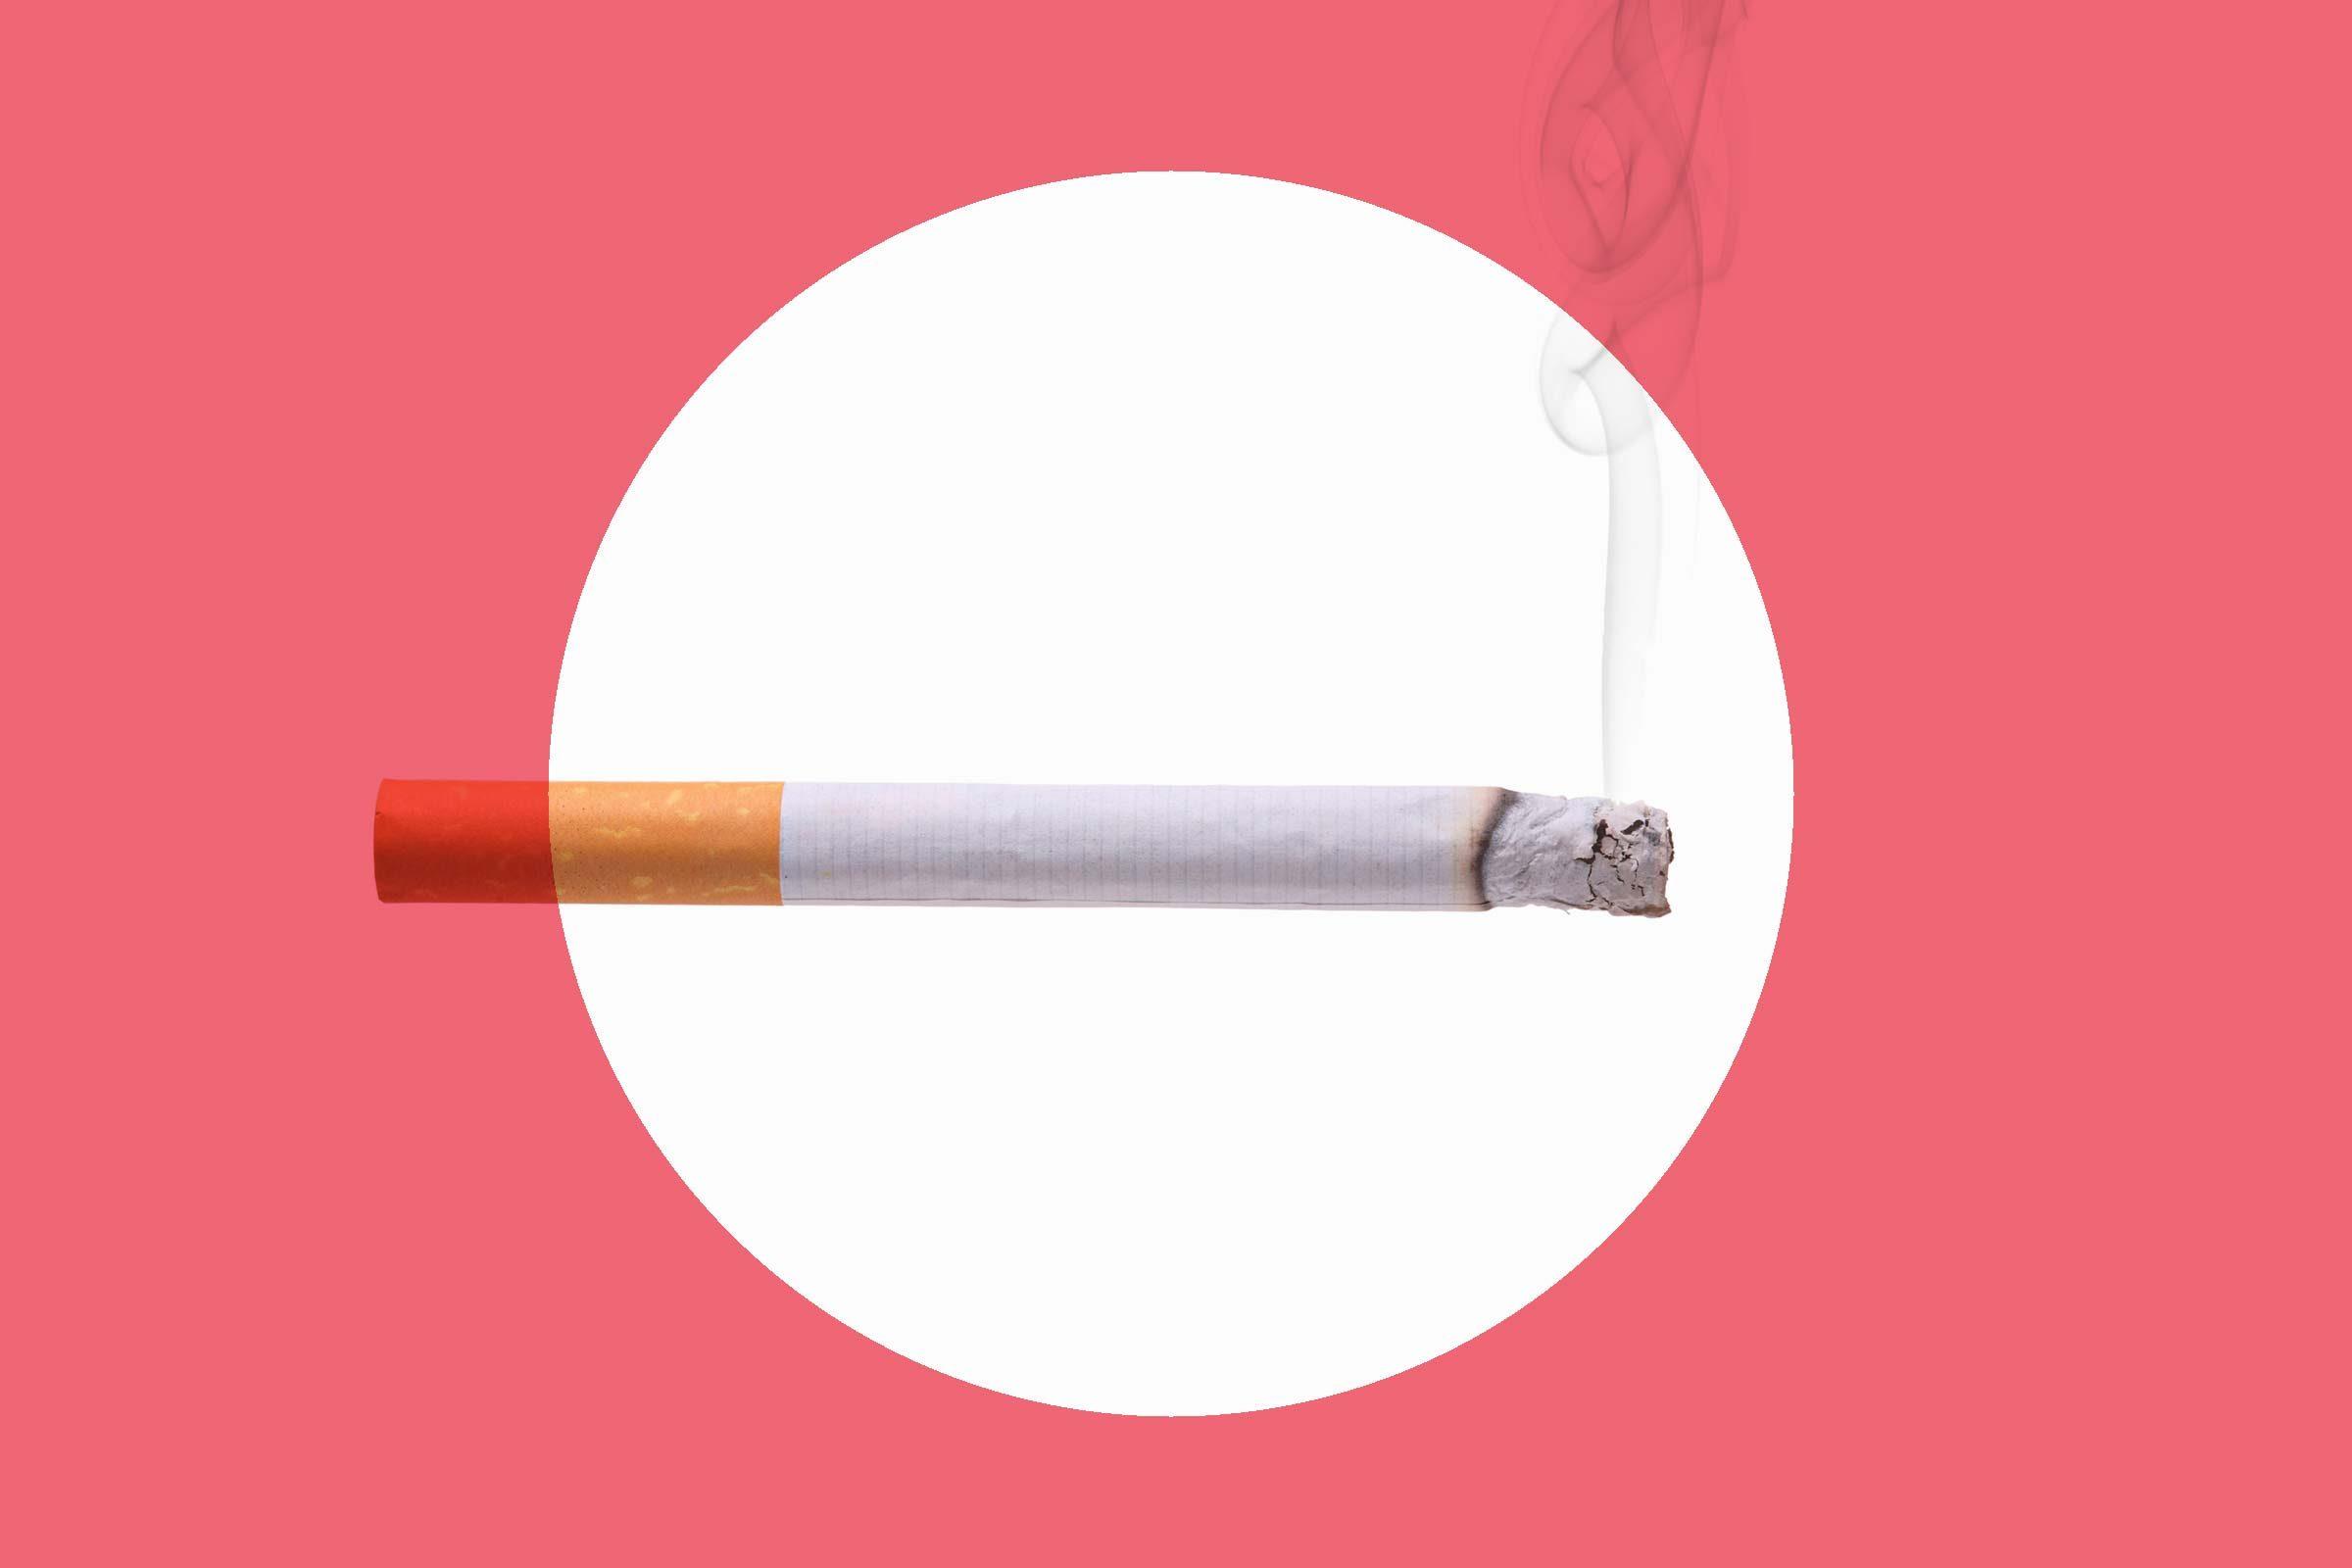 Lay off the smoking